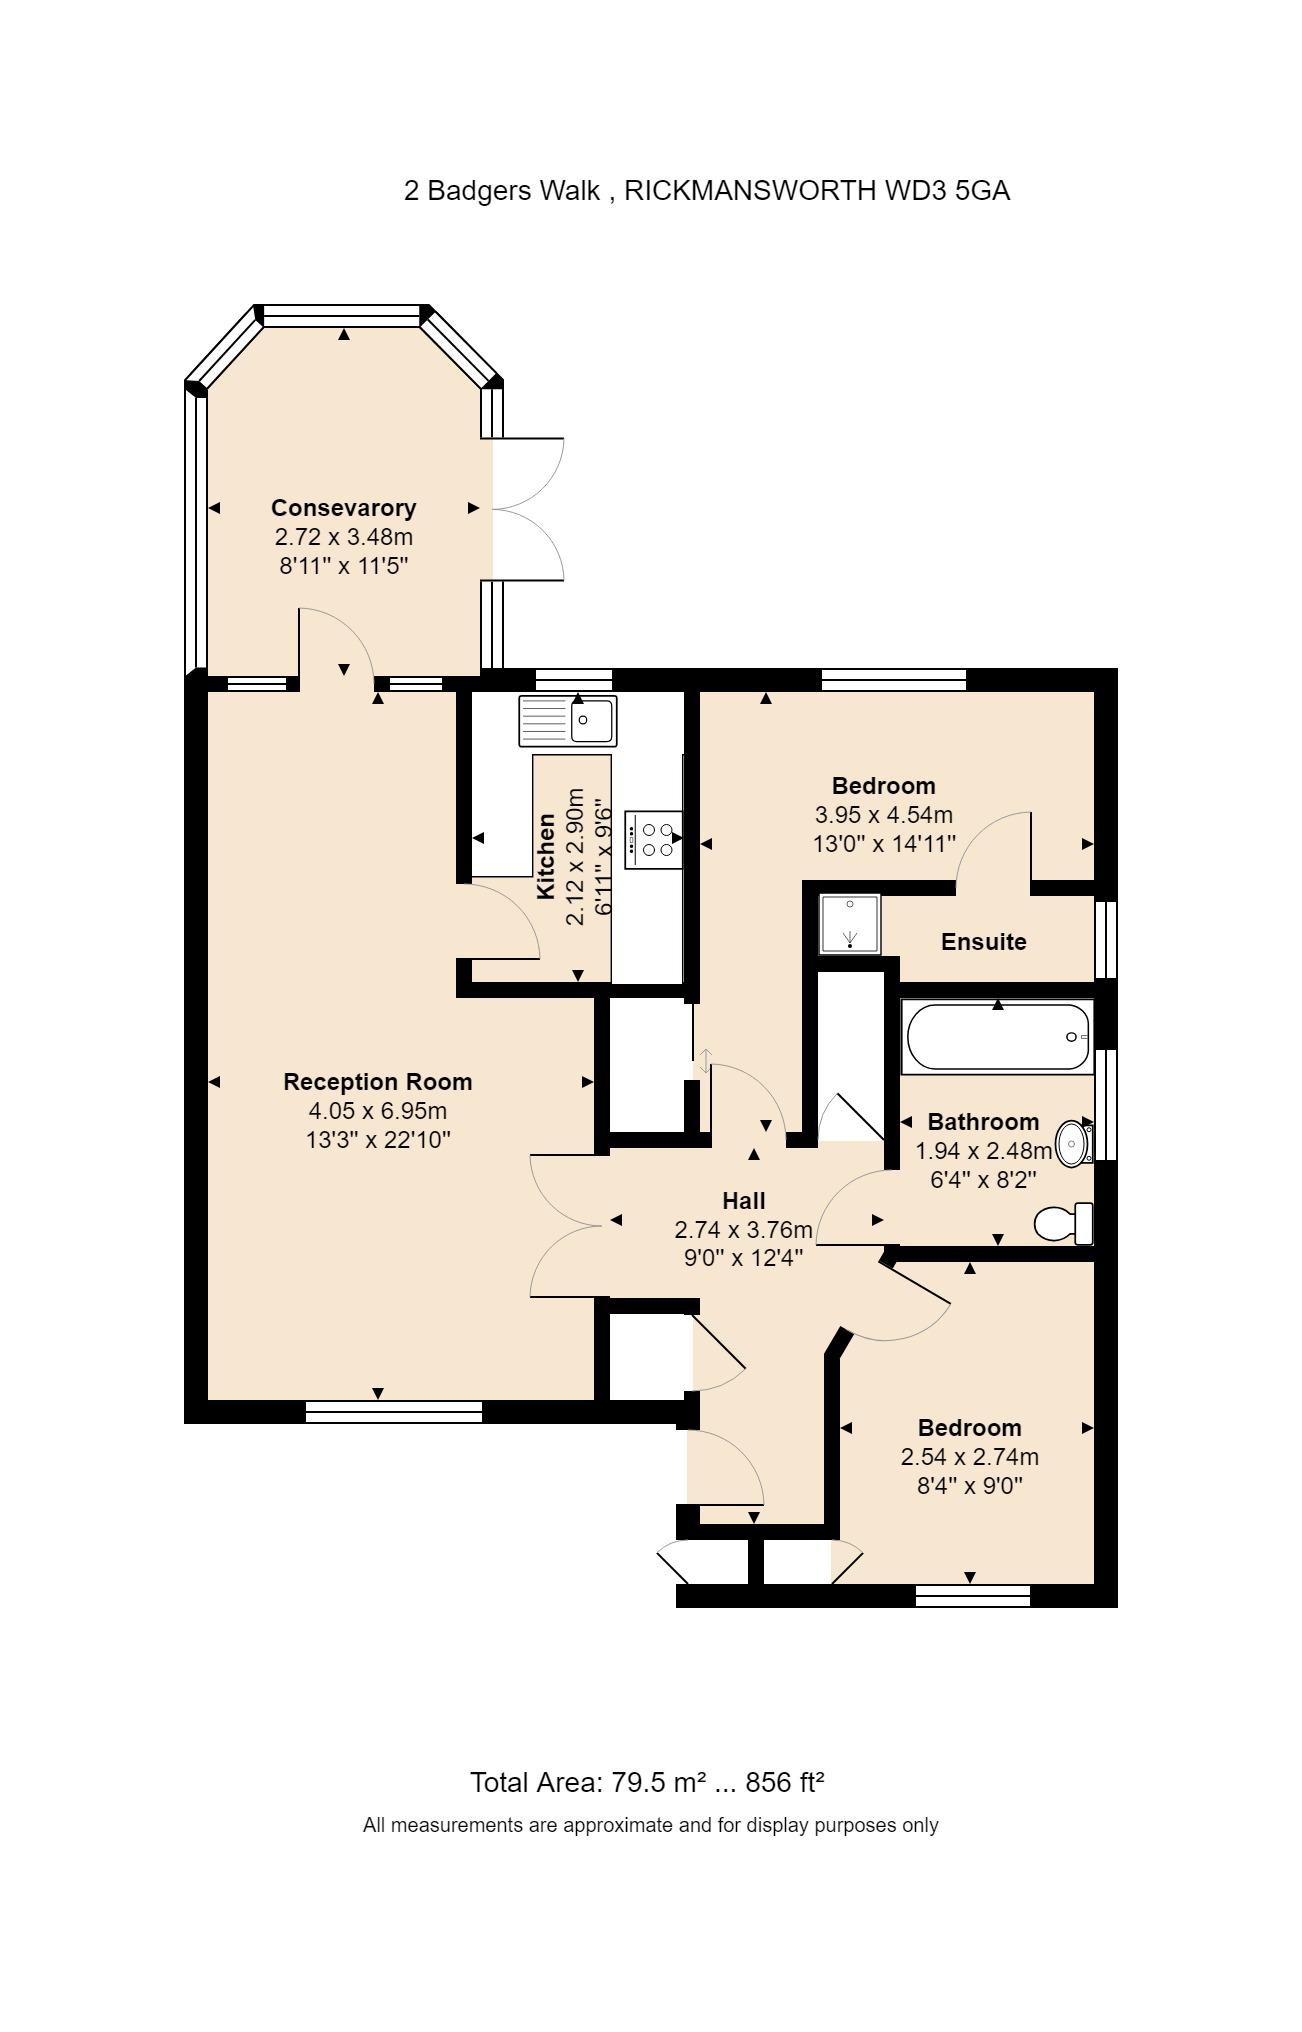 2 Badgers Walk Floorplan